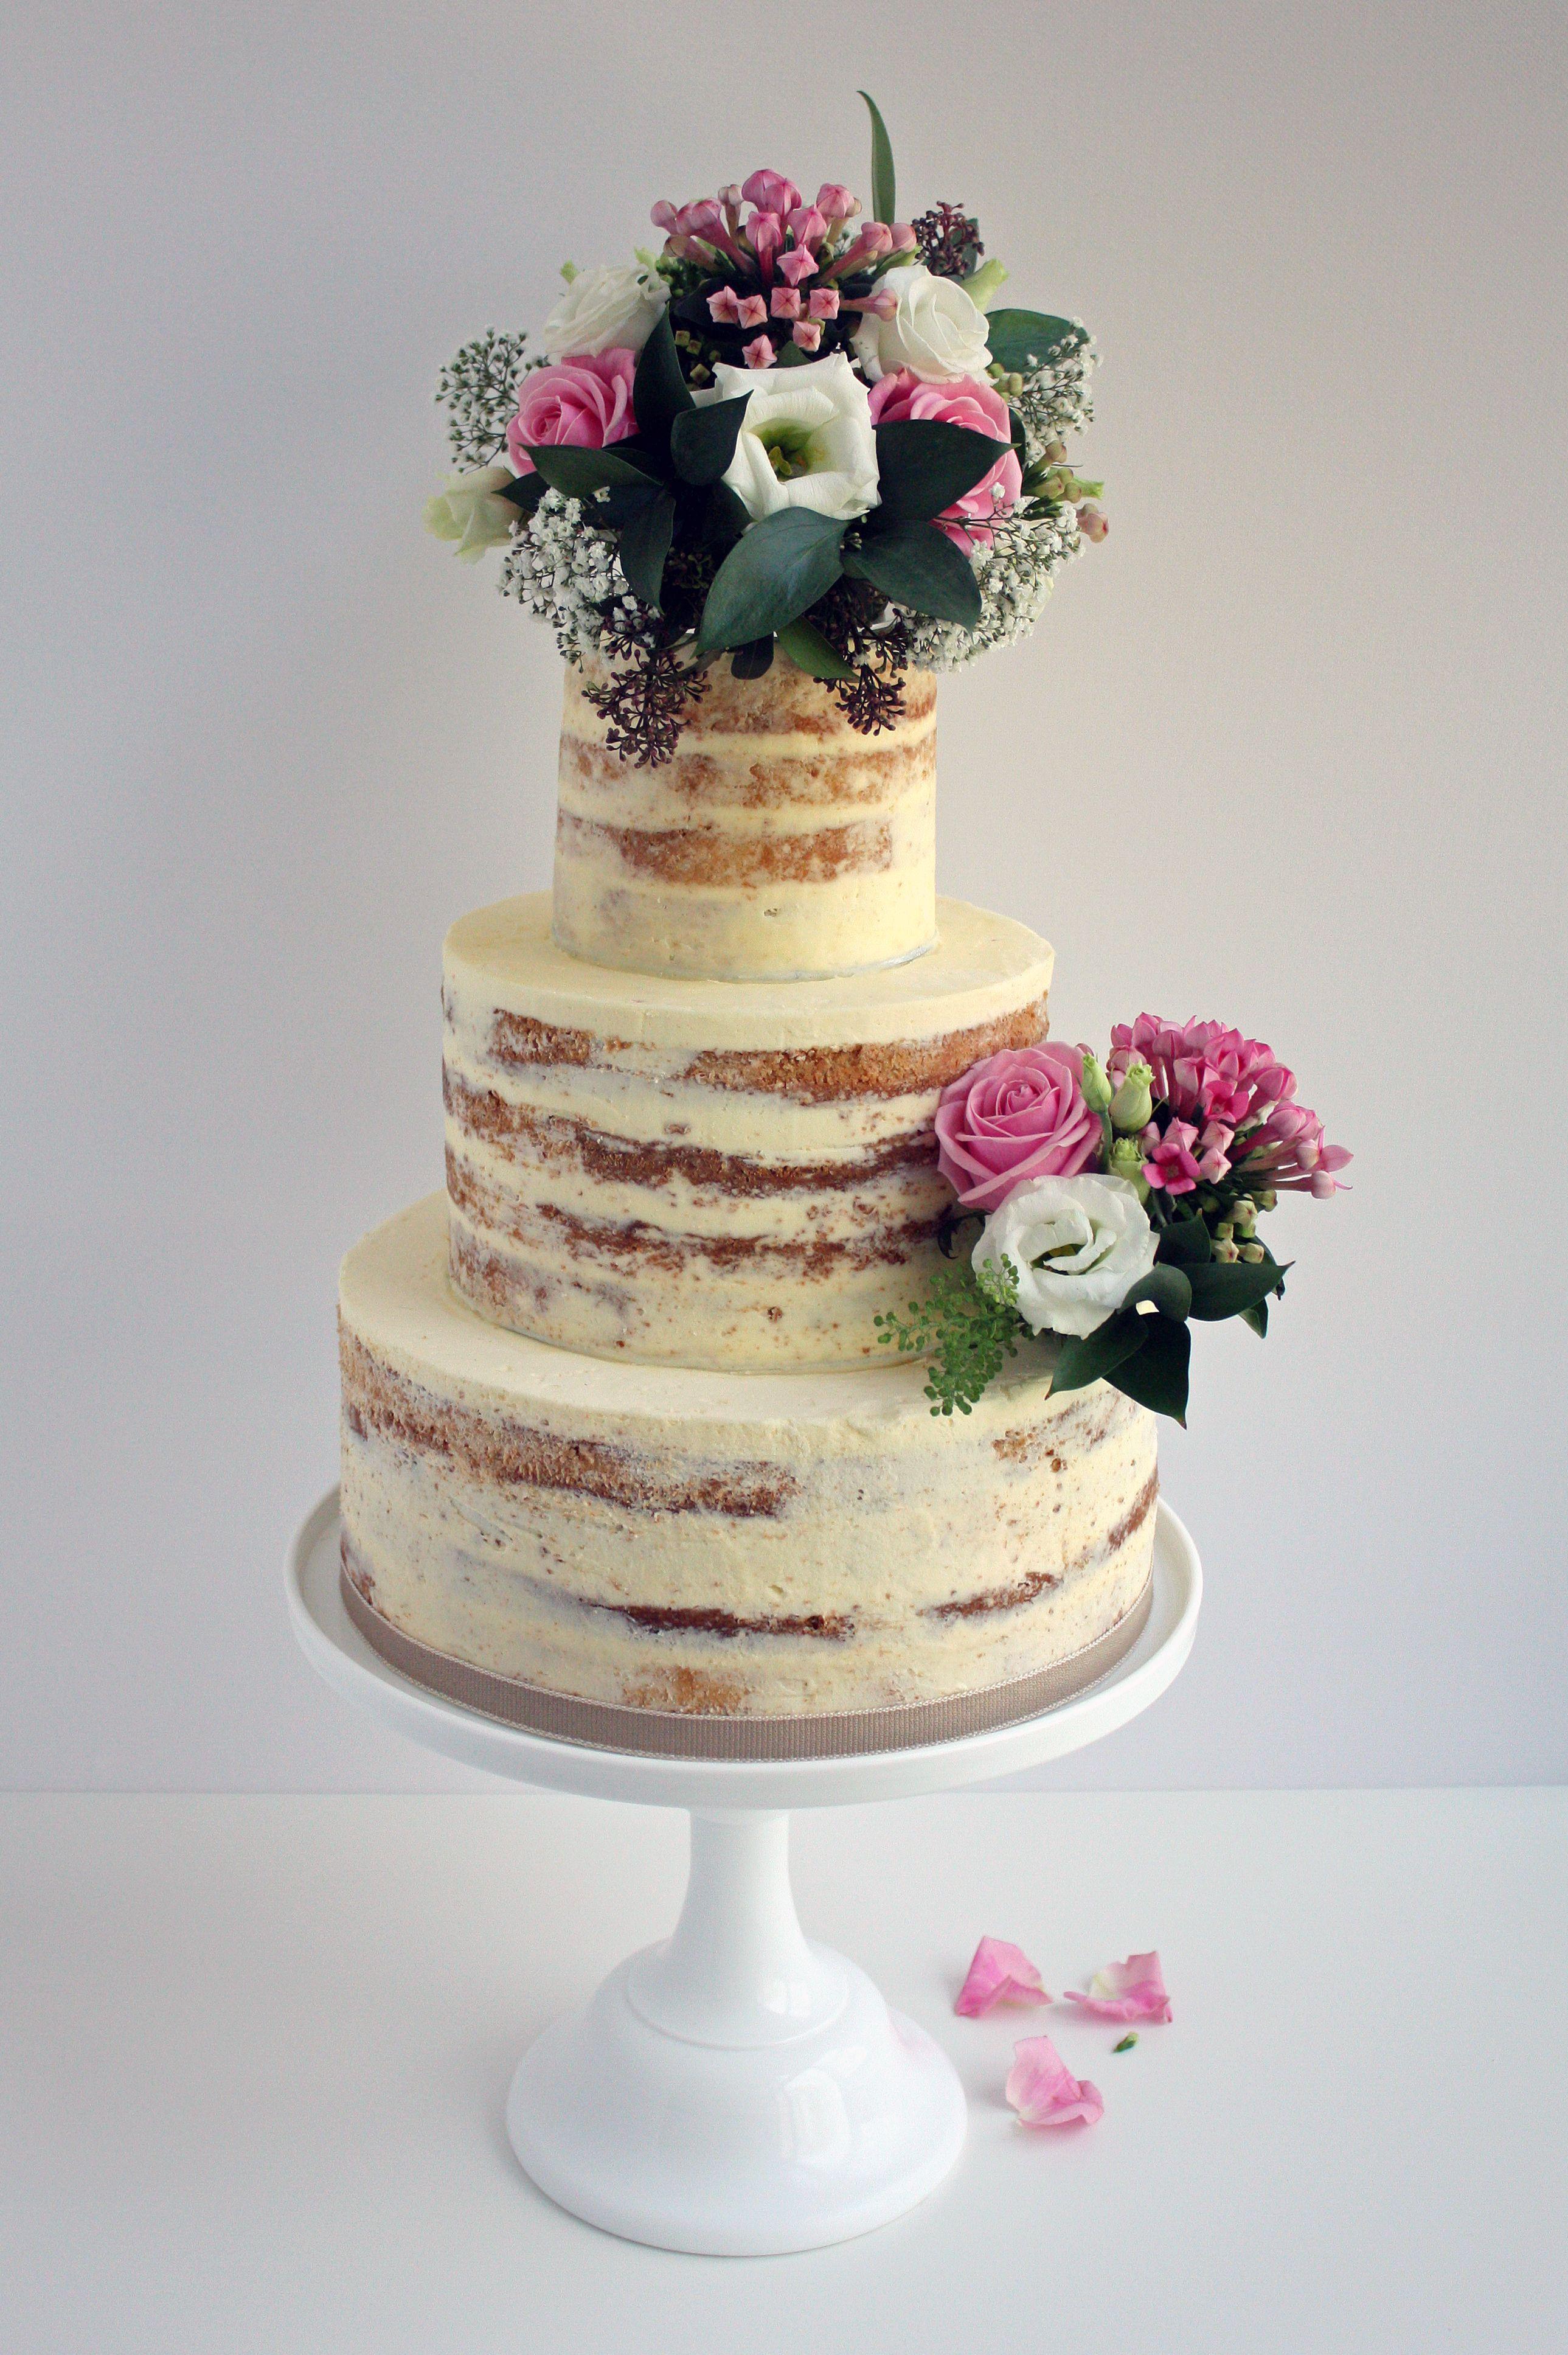 Beautiful three tier semi naked buttercream wedding cake decorated with fresh flowers